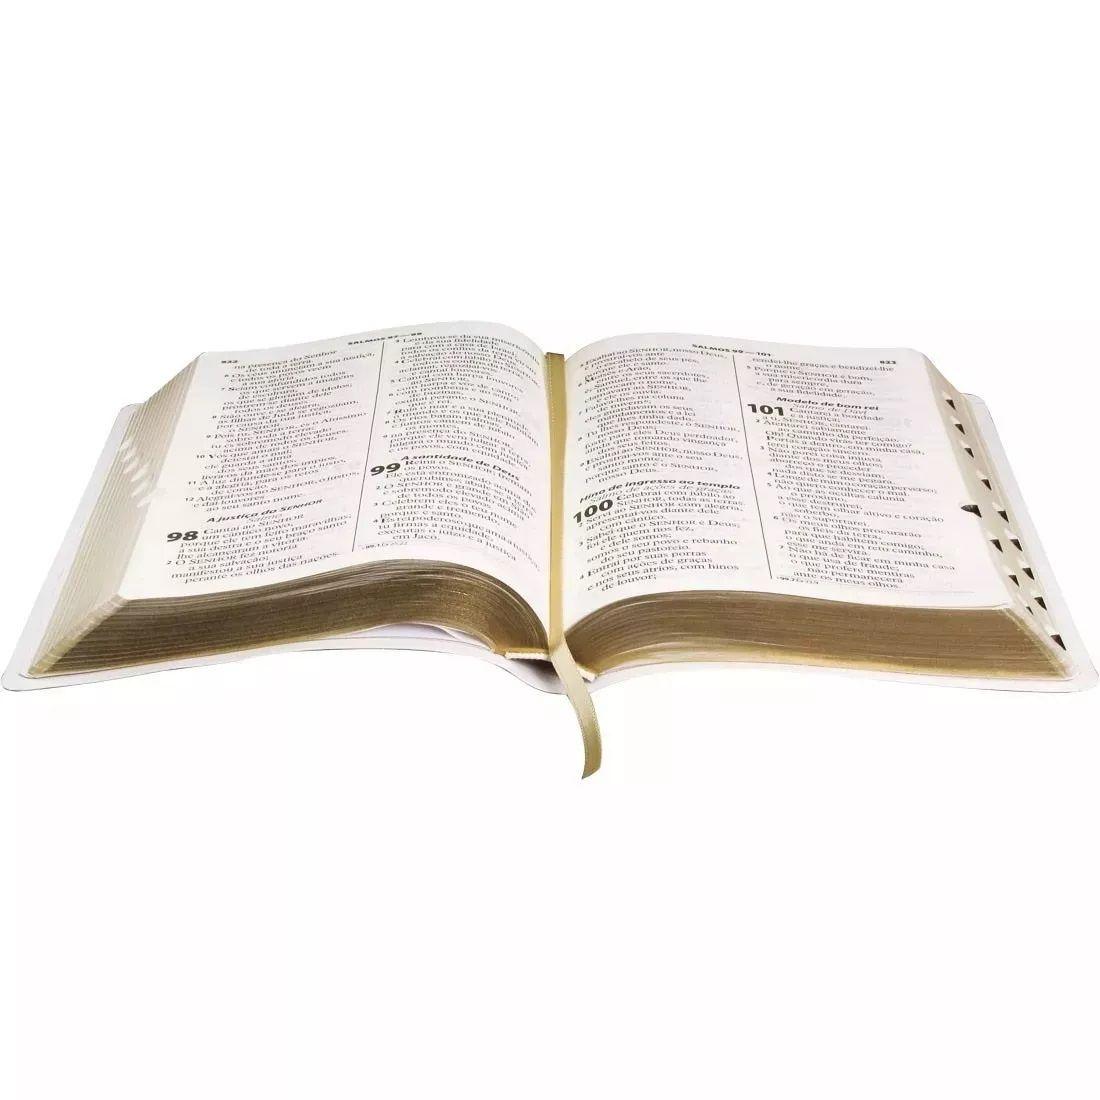 Bíblia Sagrada Letra Gigante c/Índice Notas Referências Branca